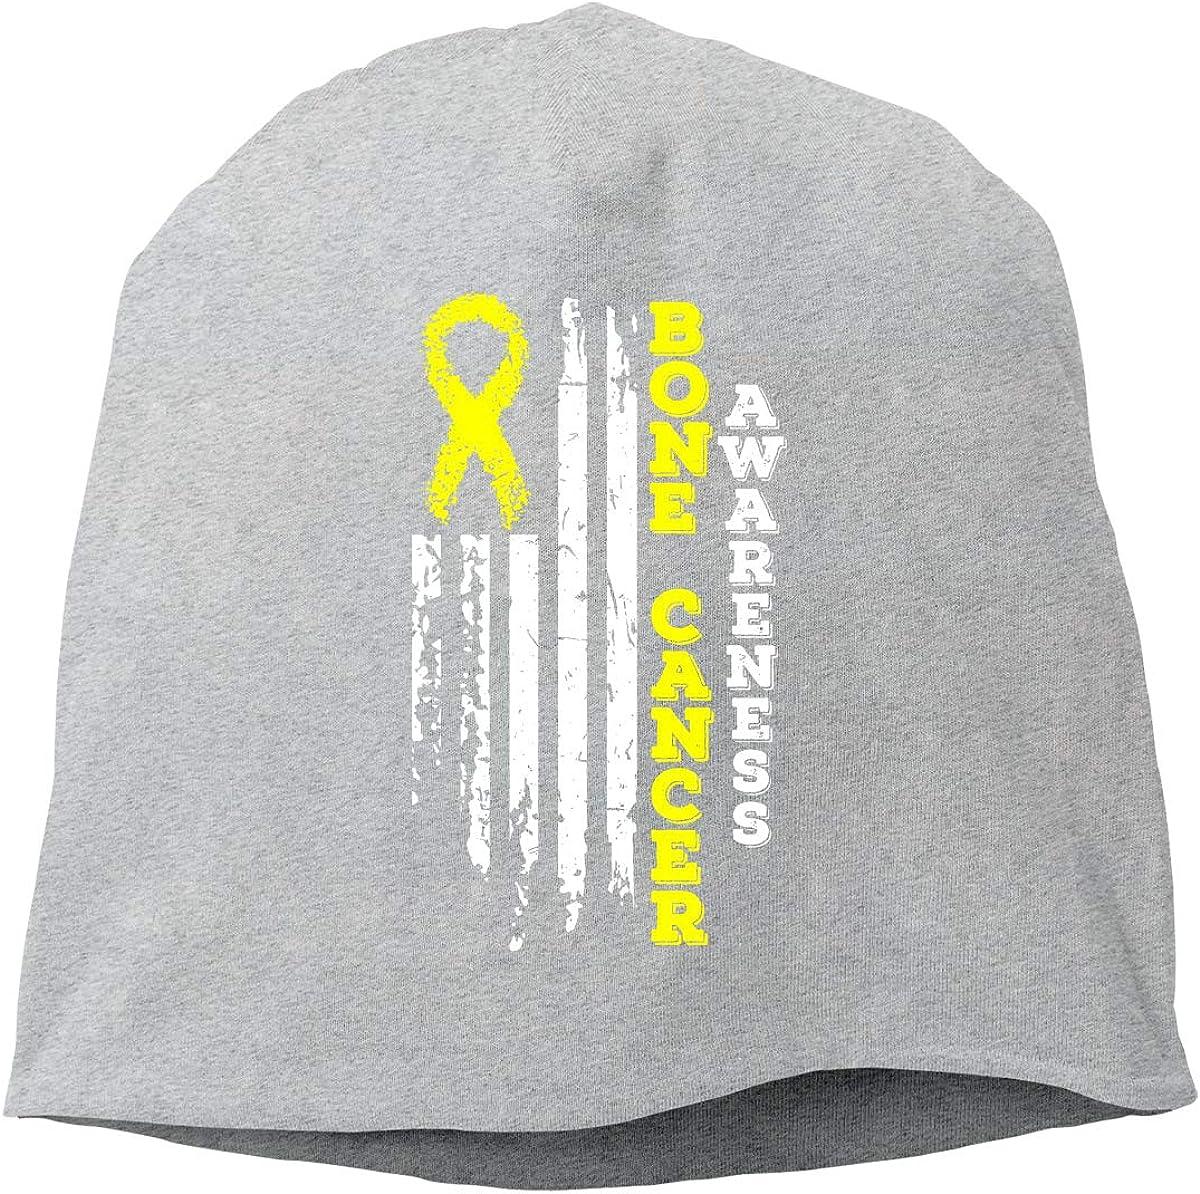 USA Flag Bone Cancer Awareness Unisex Knitted Hat Beanie Hat Warm Hats Skull Cap